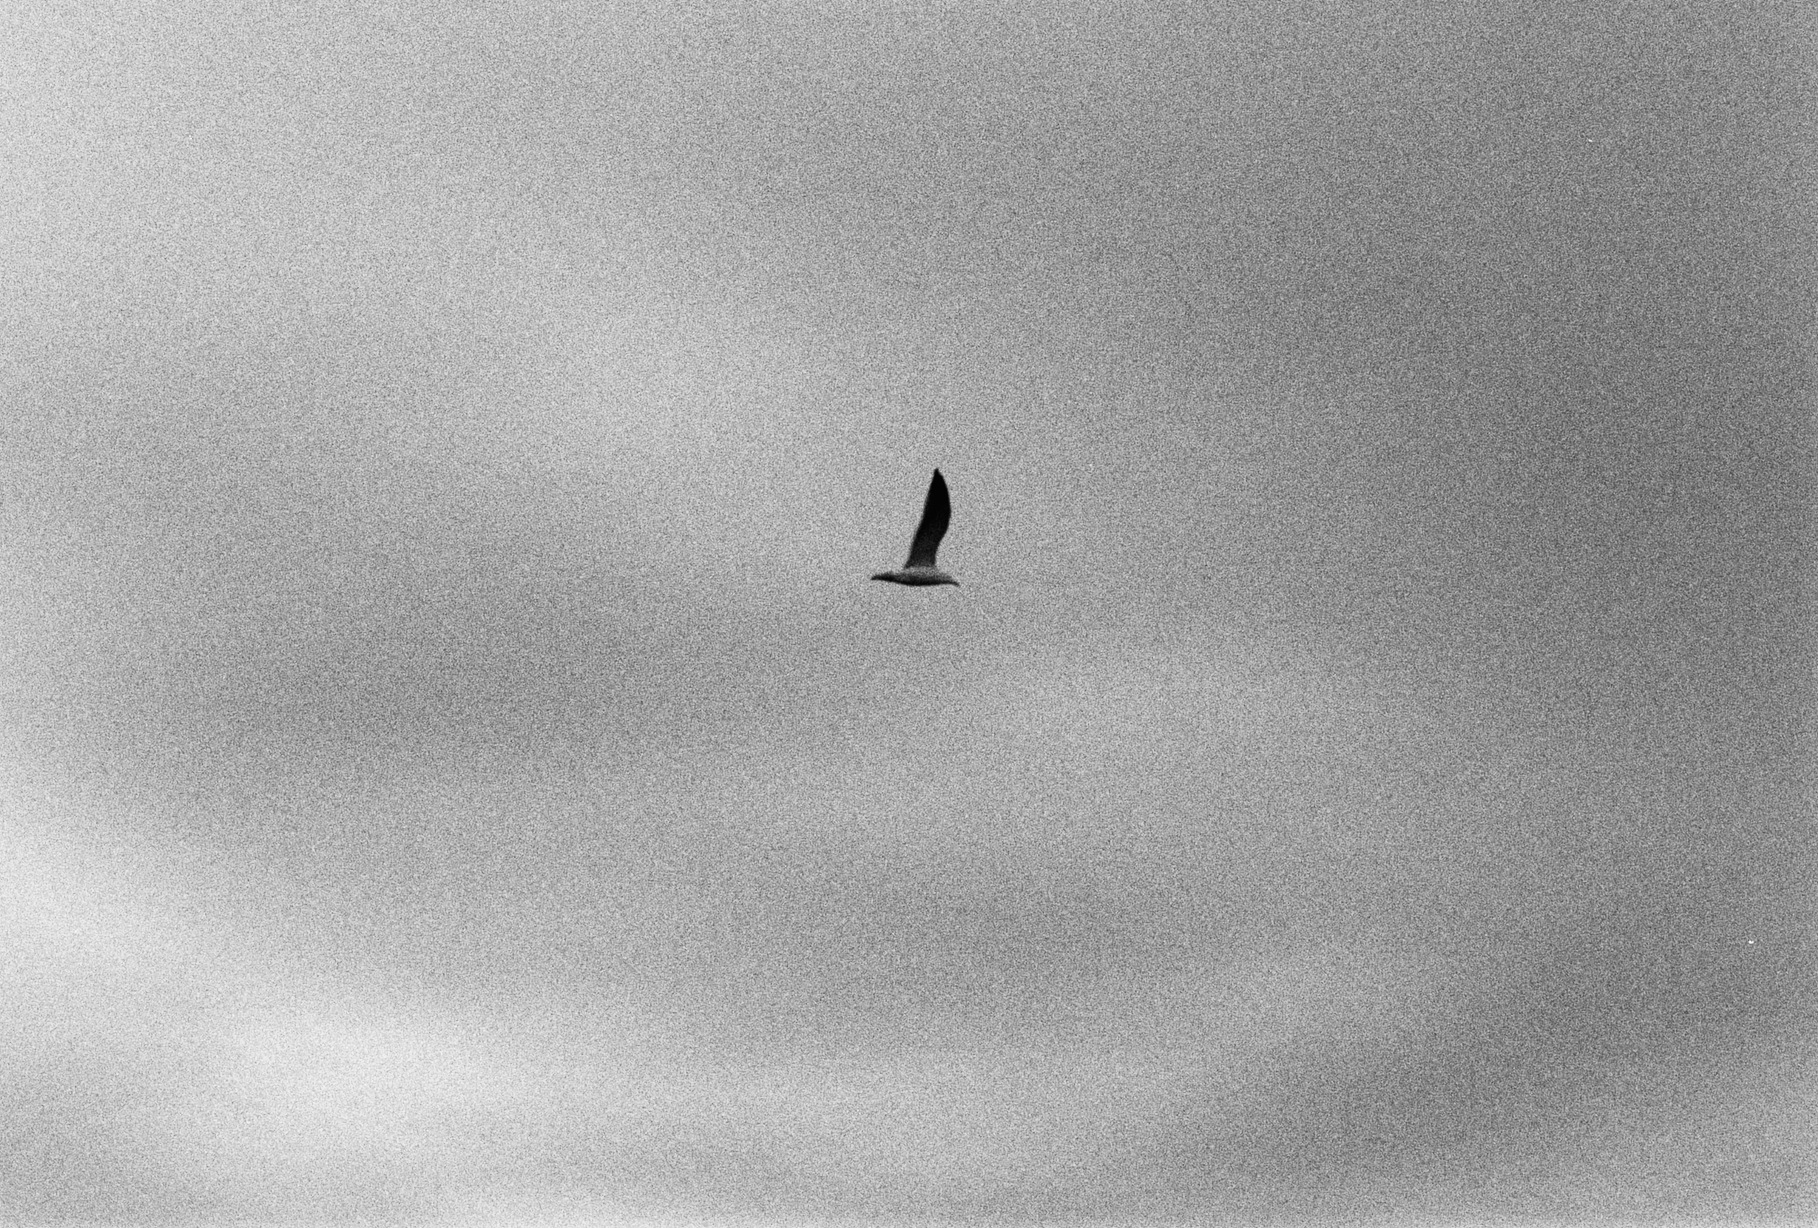 Ian Kenneth Bird